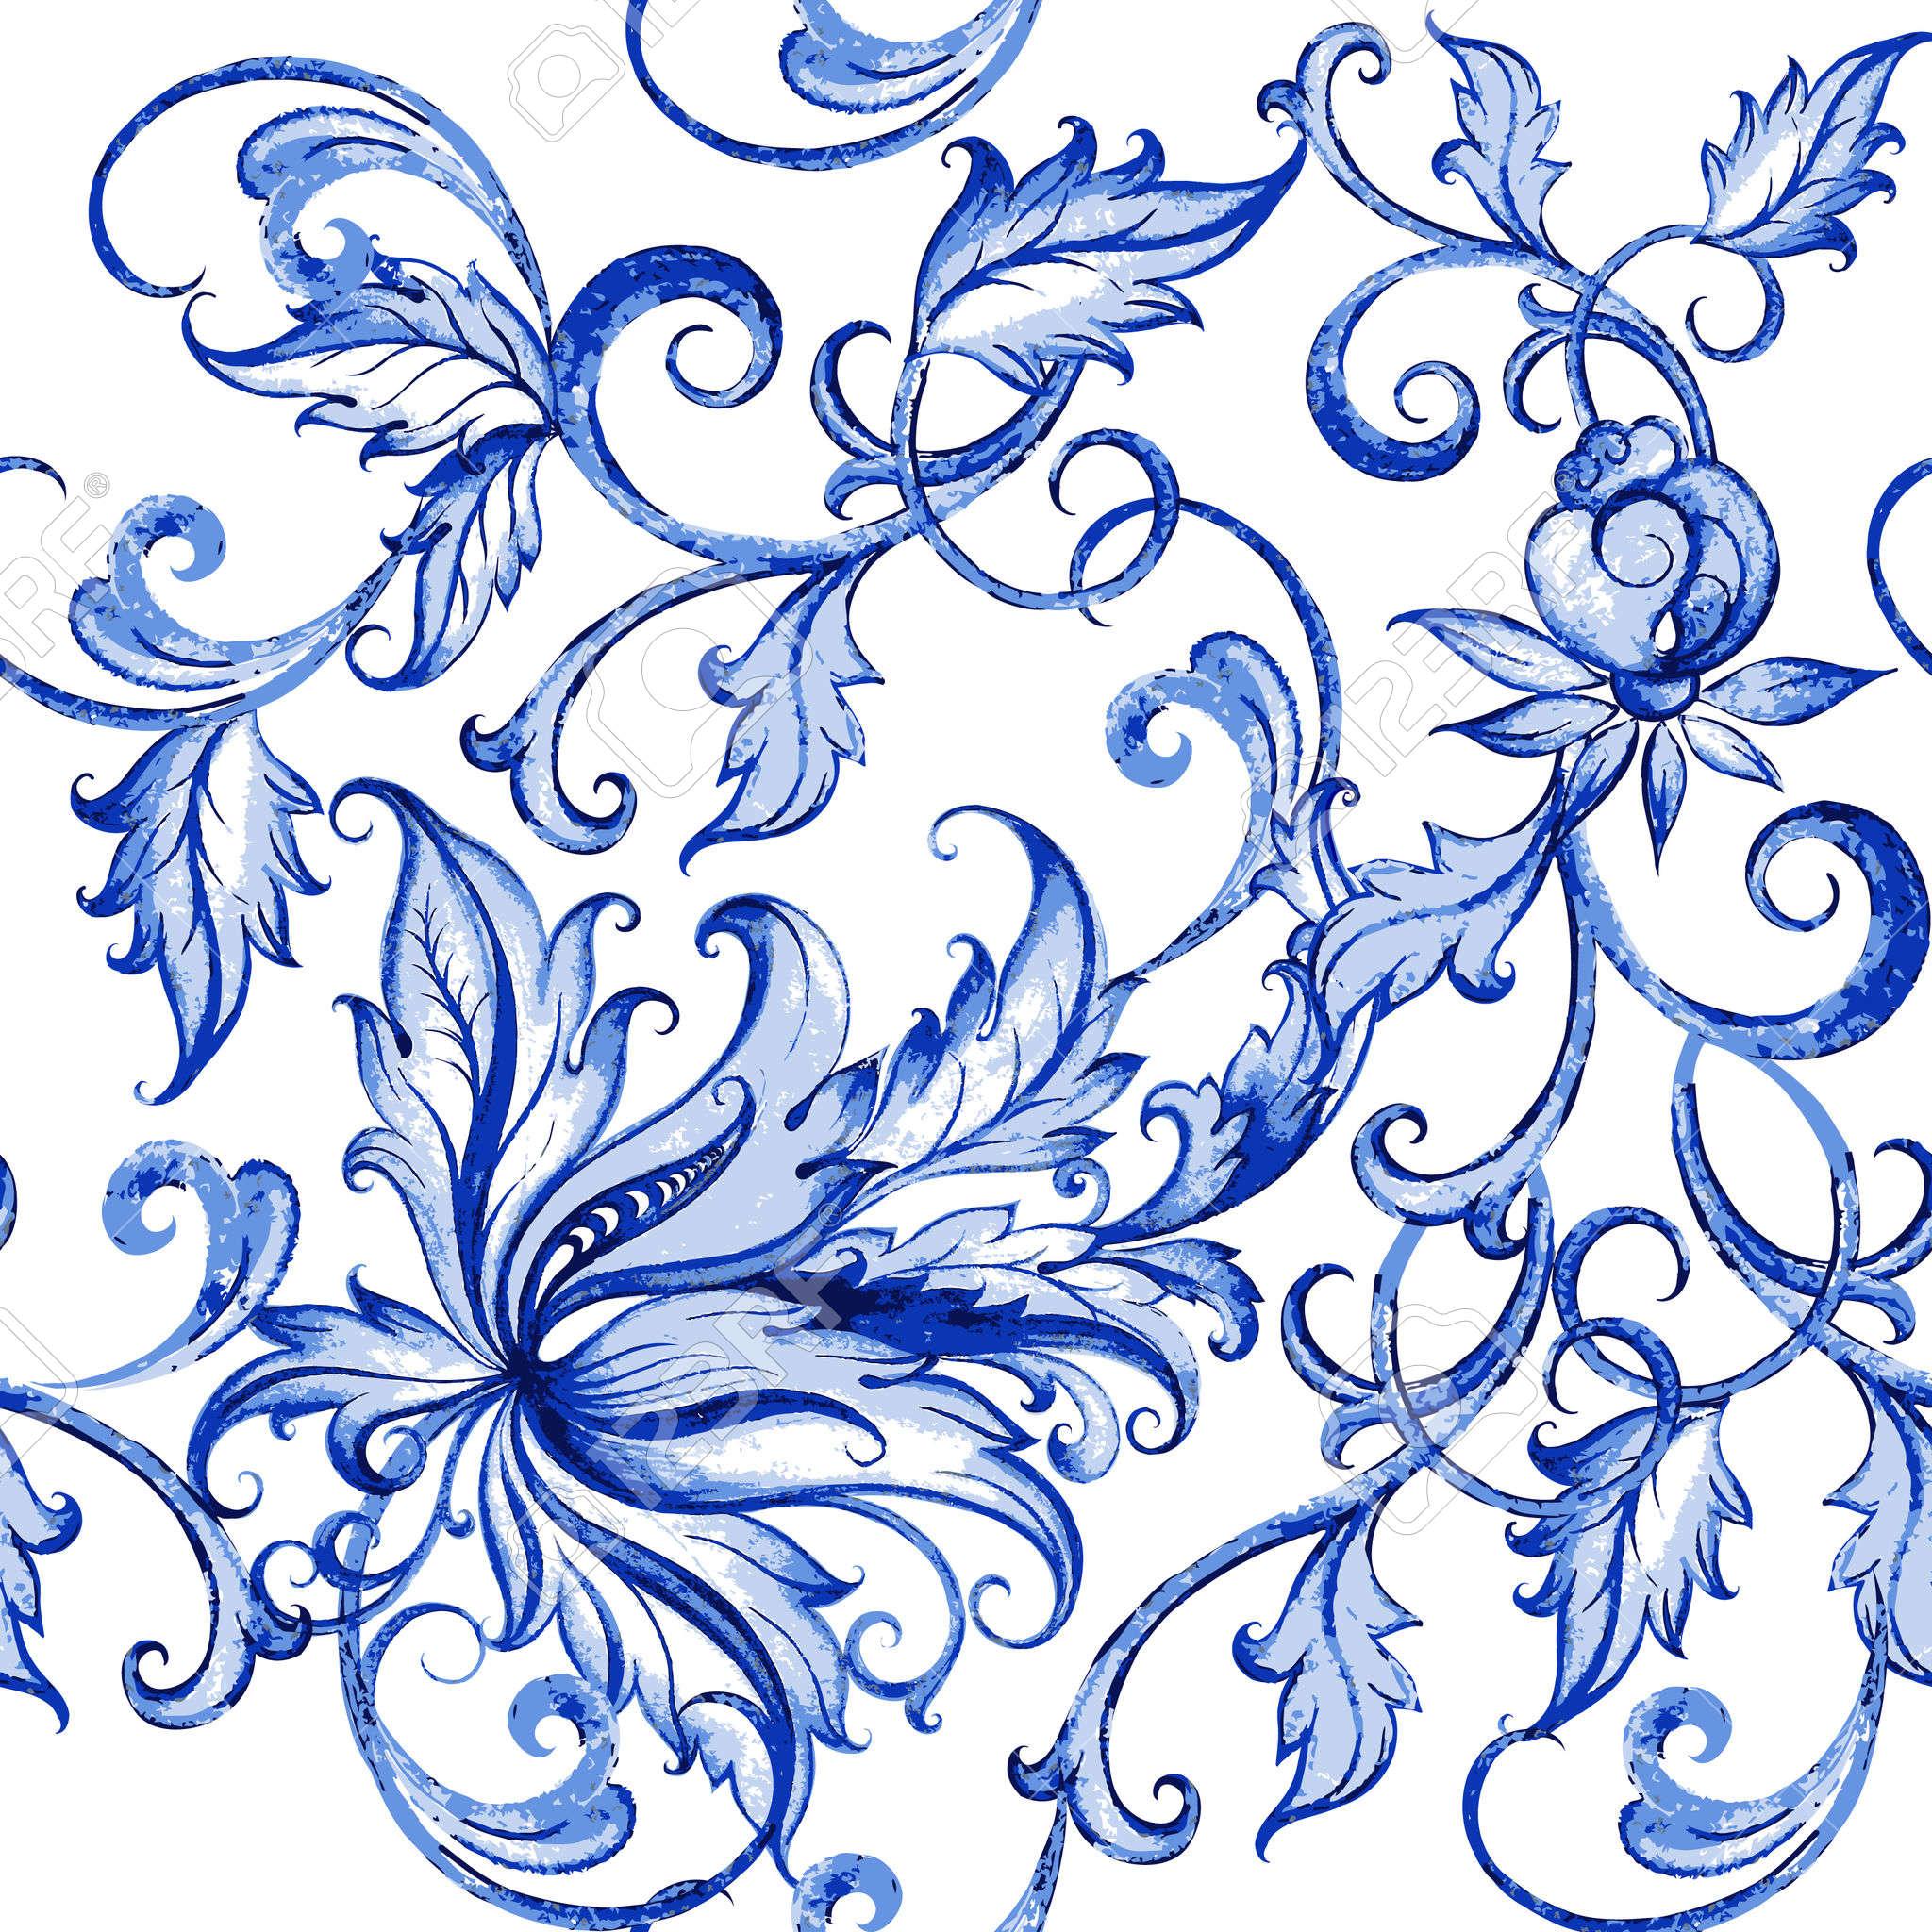 2048x2048 Vector Acquarello Floreale Texture Con Flowers.watercolor Motivo